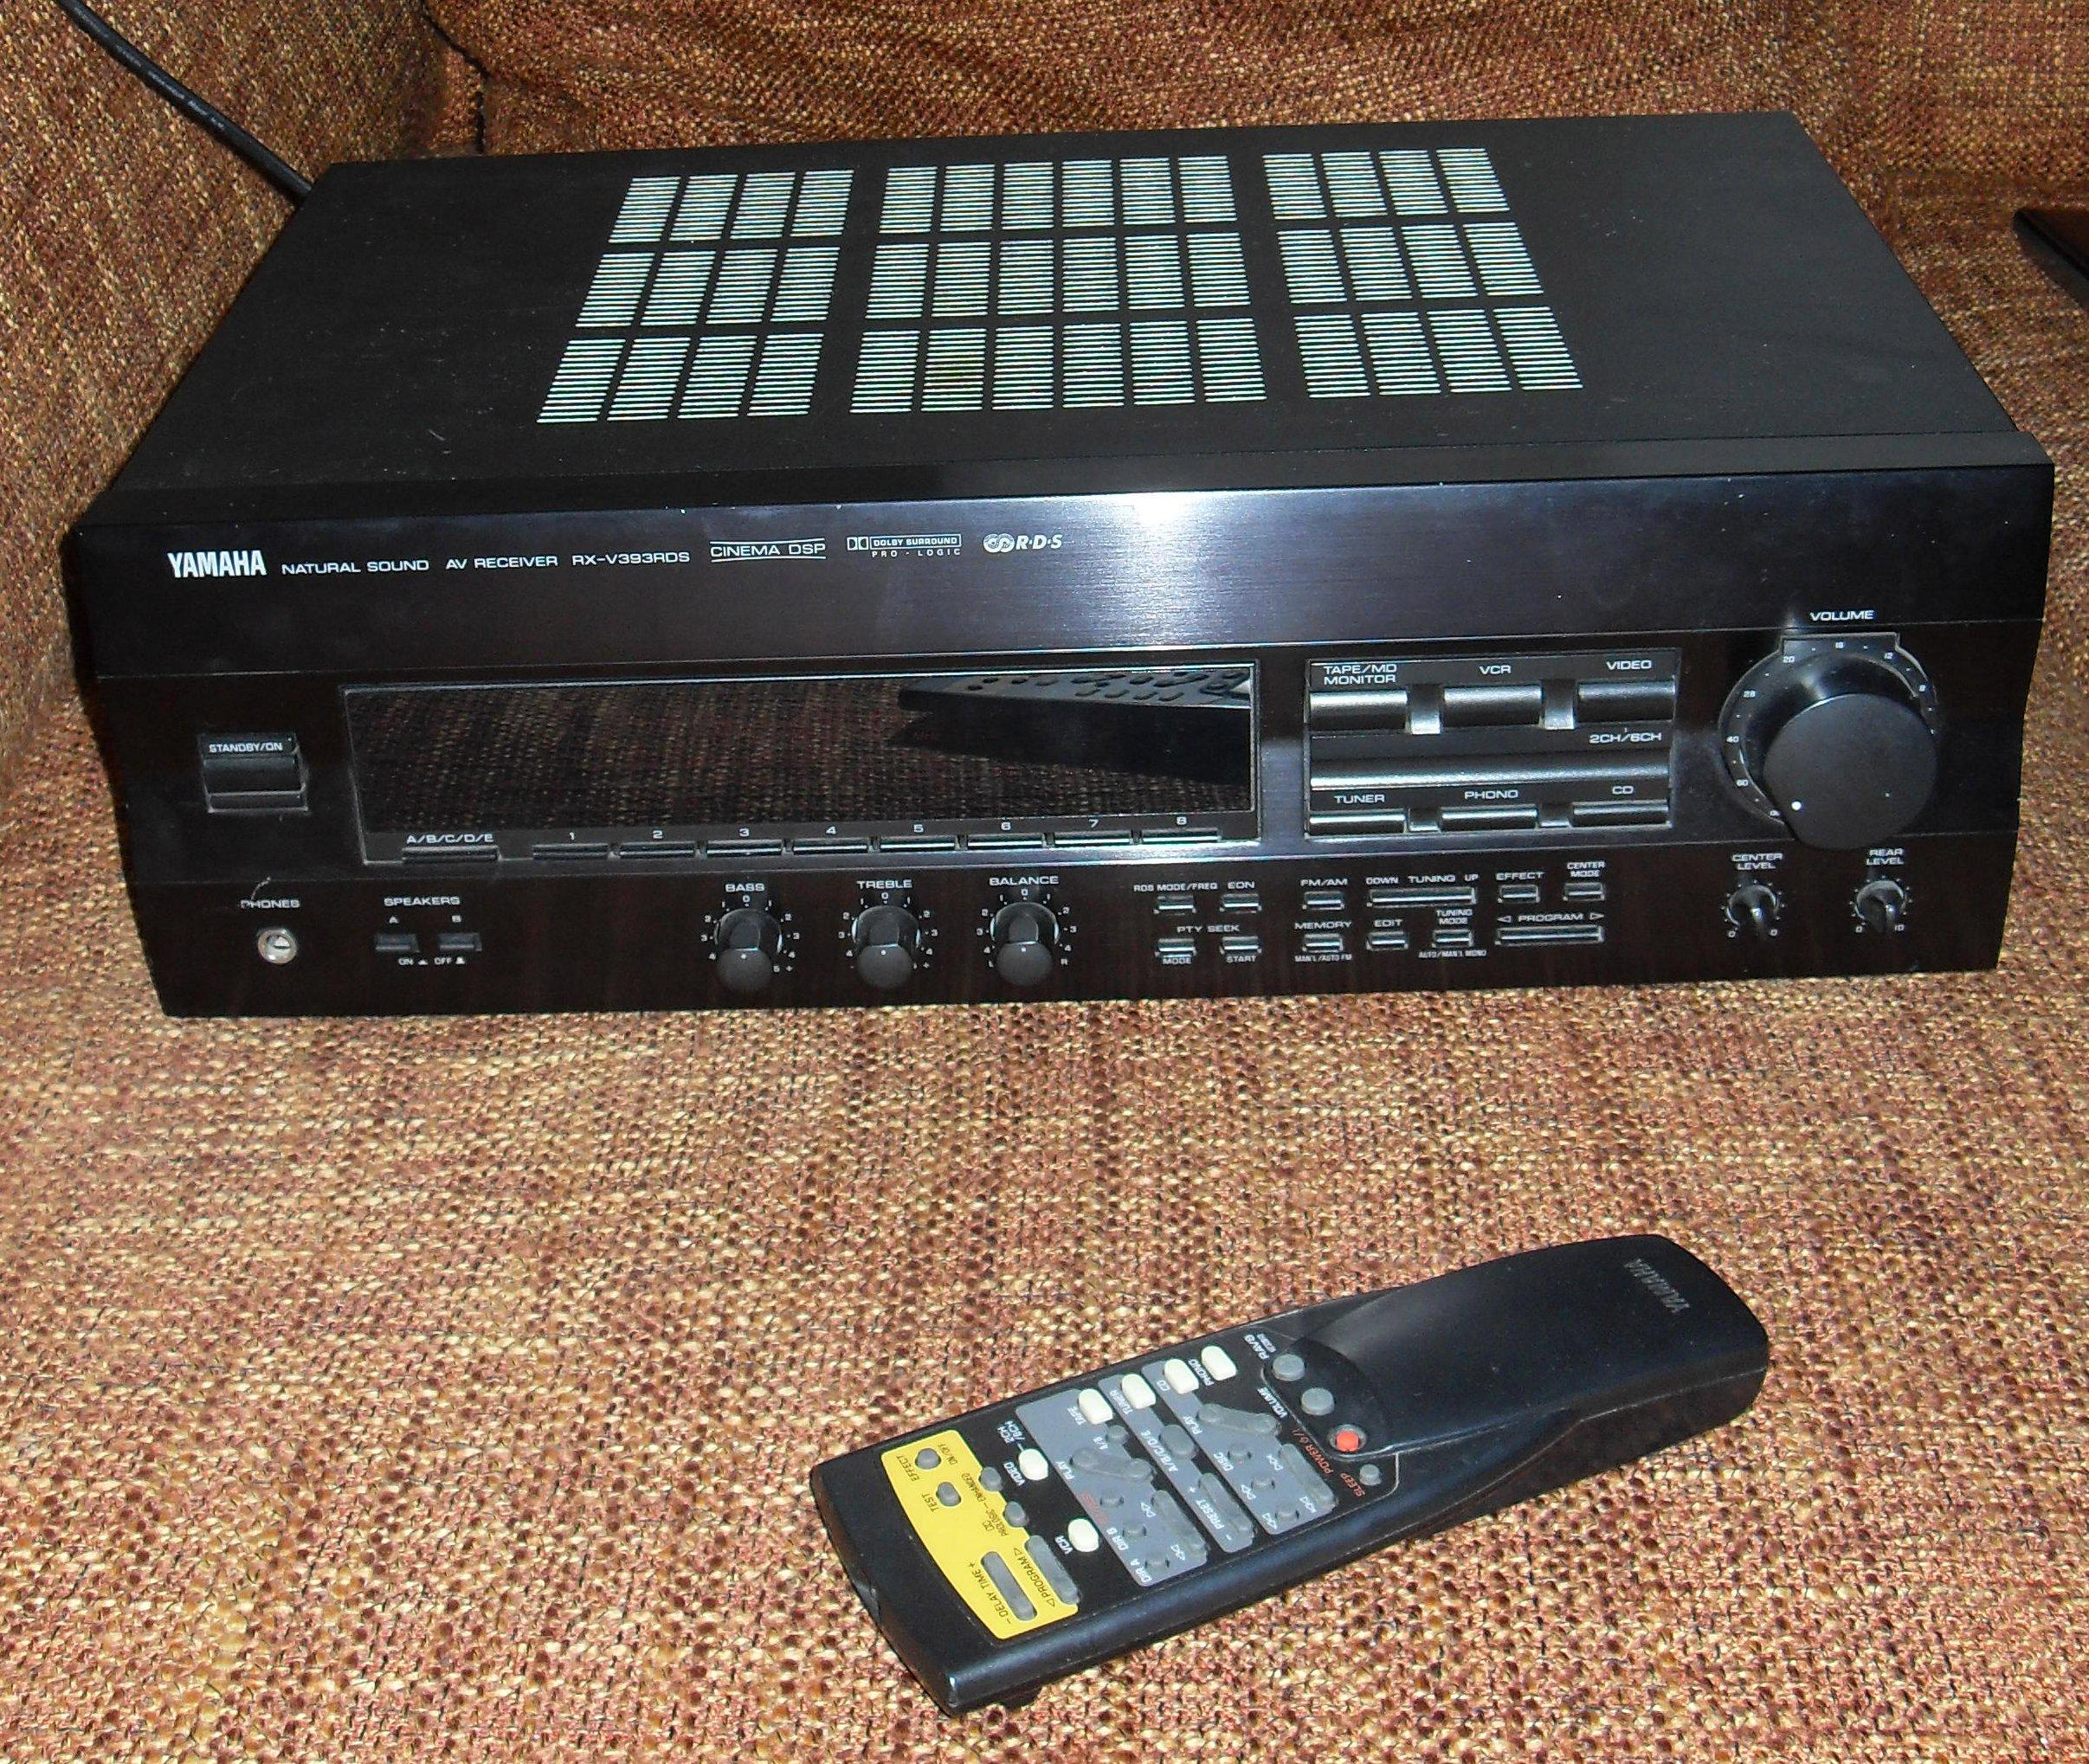 File:Yamaha Receiver RX-V 393 JPG - Wikimedia Commons